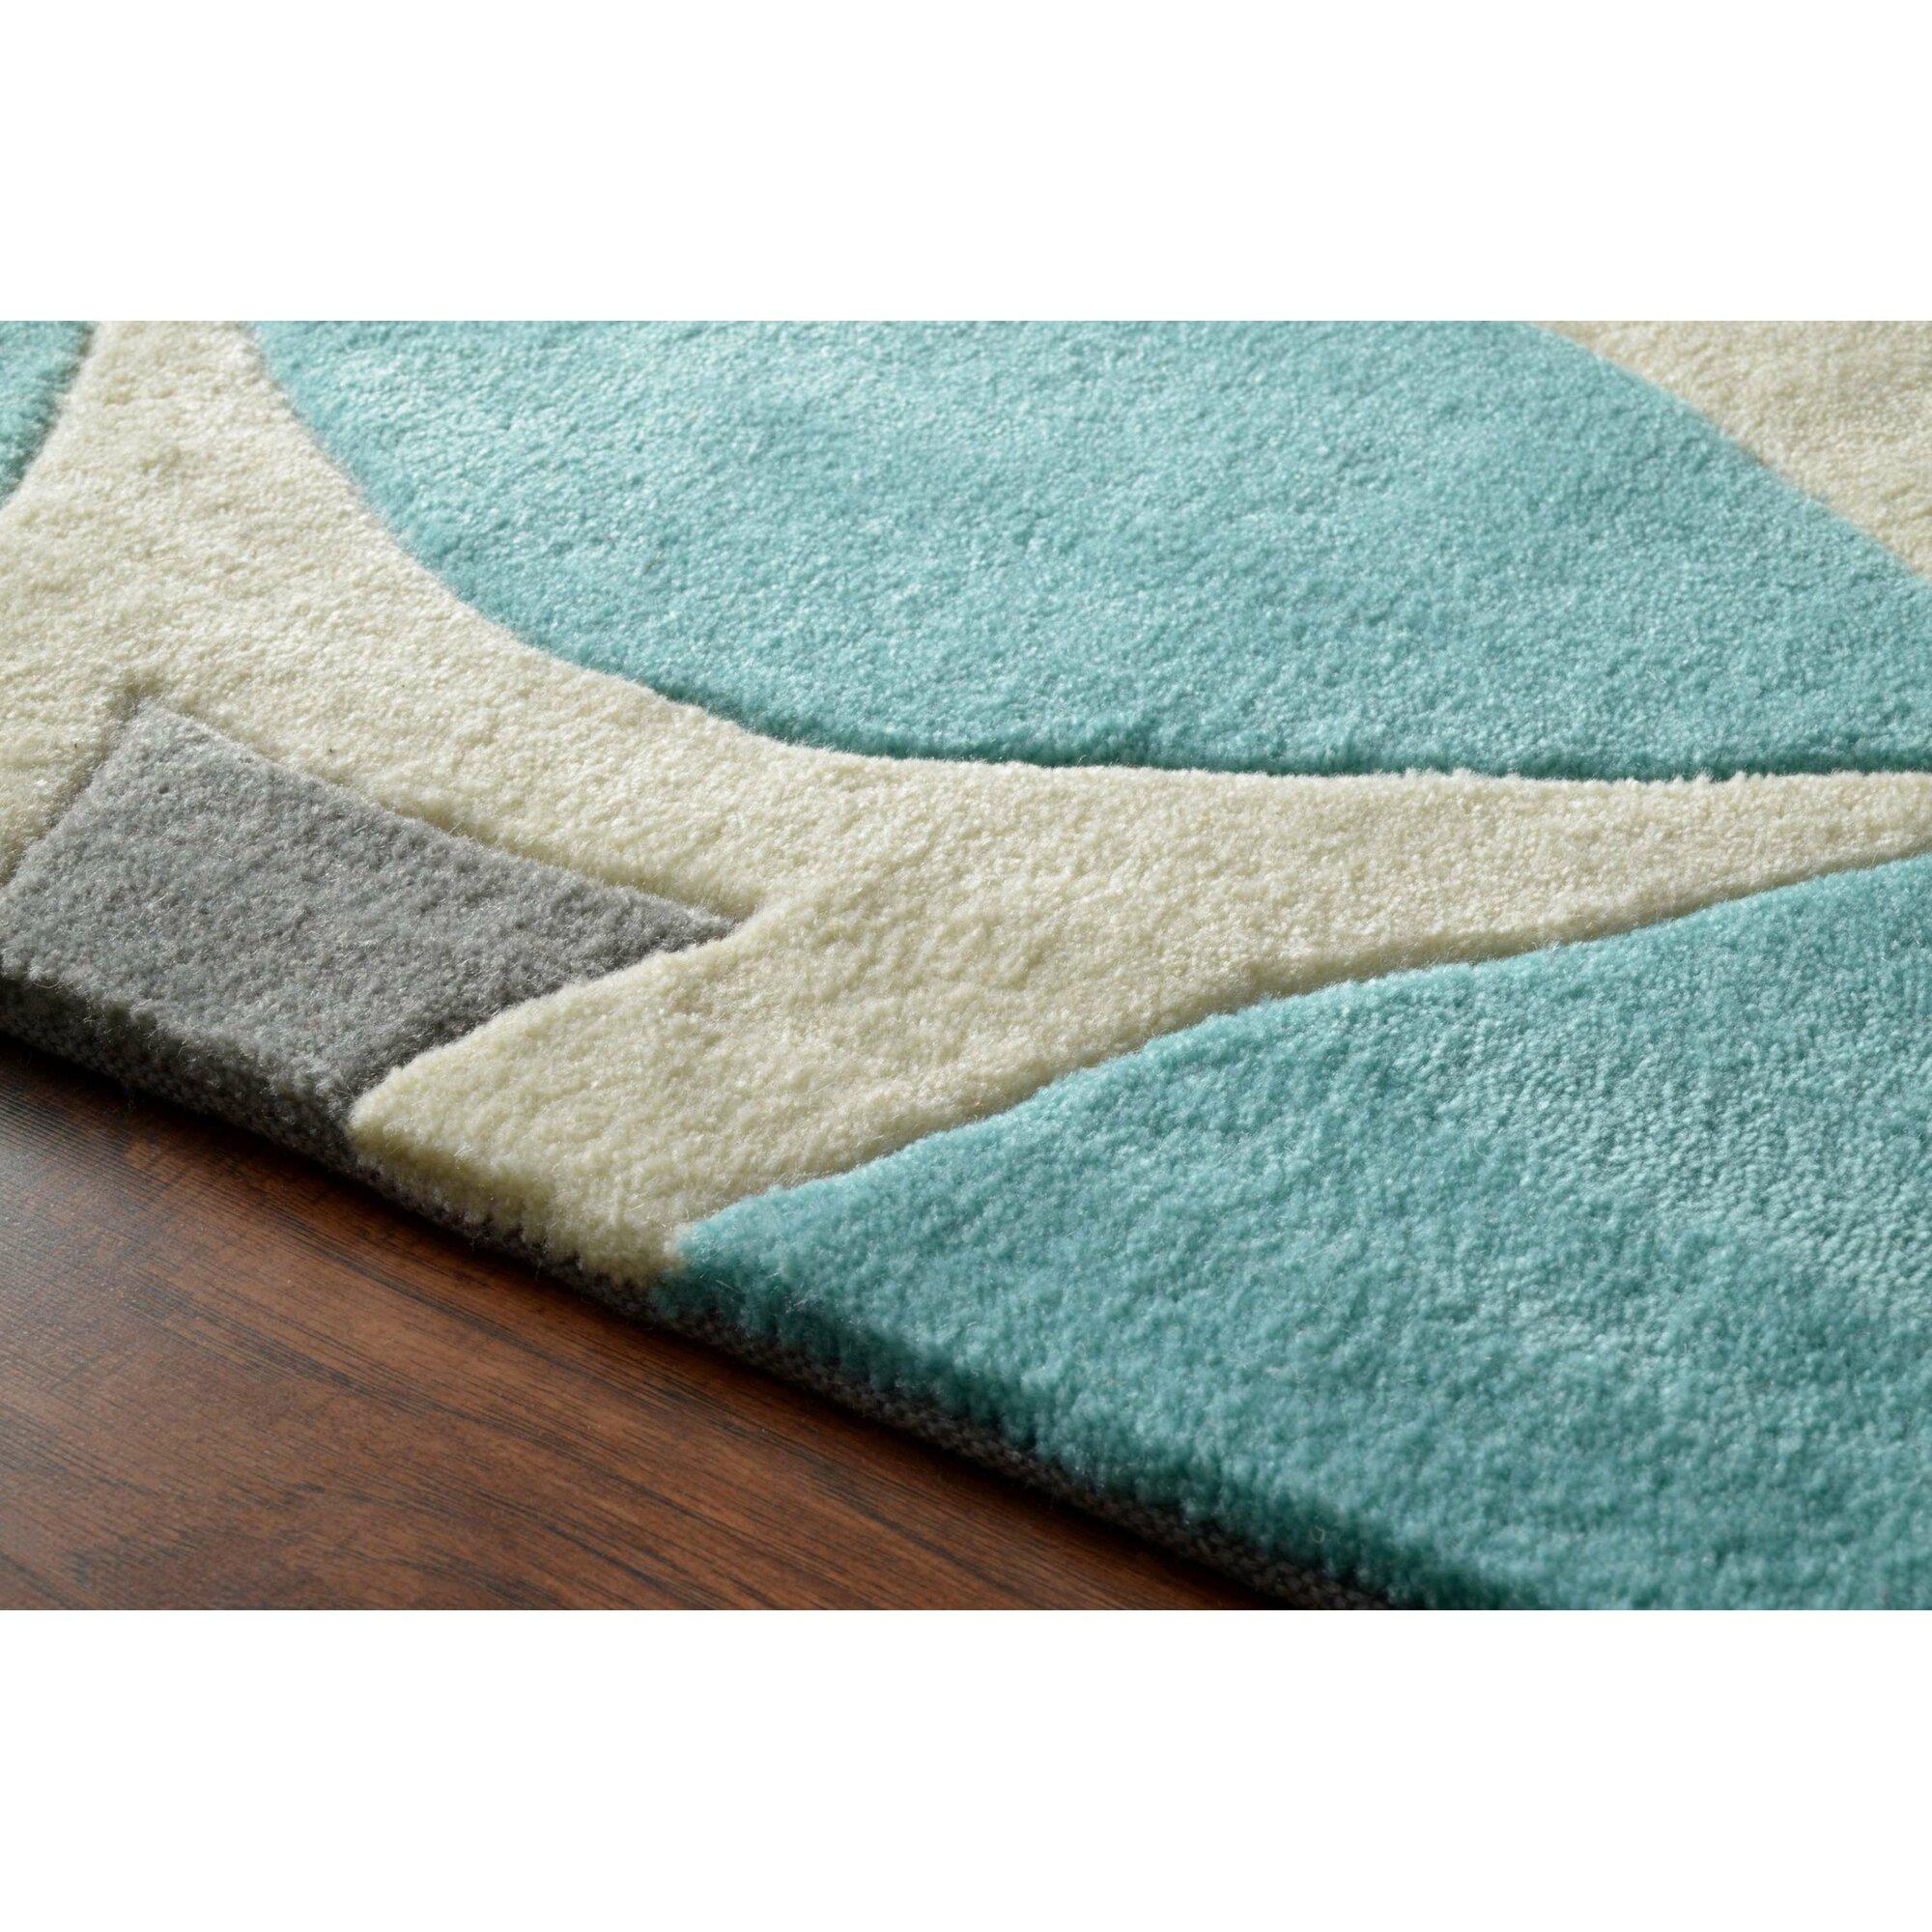 brayden studio crispin hand tufted baby blue white area. Black Bedroom Furniture Sets. Home Design Ideas